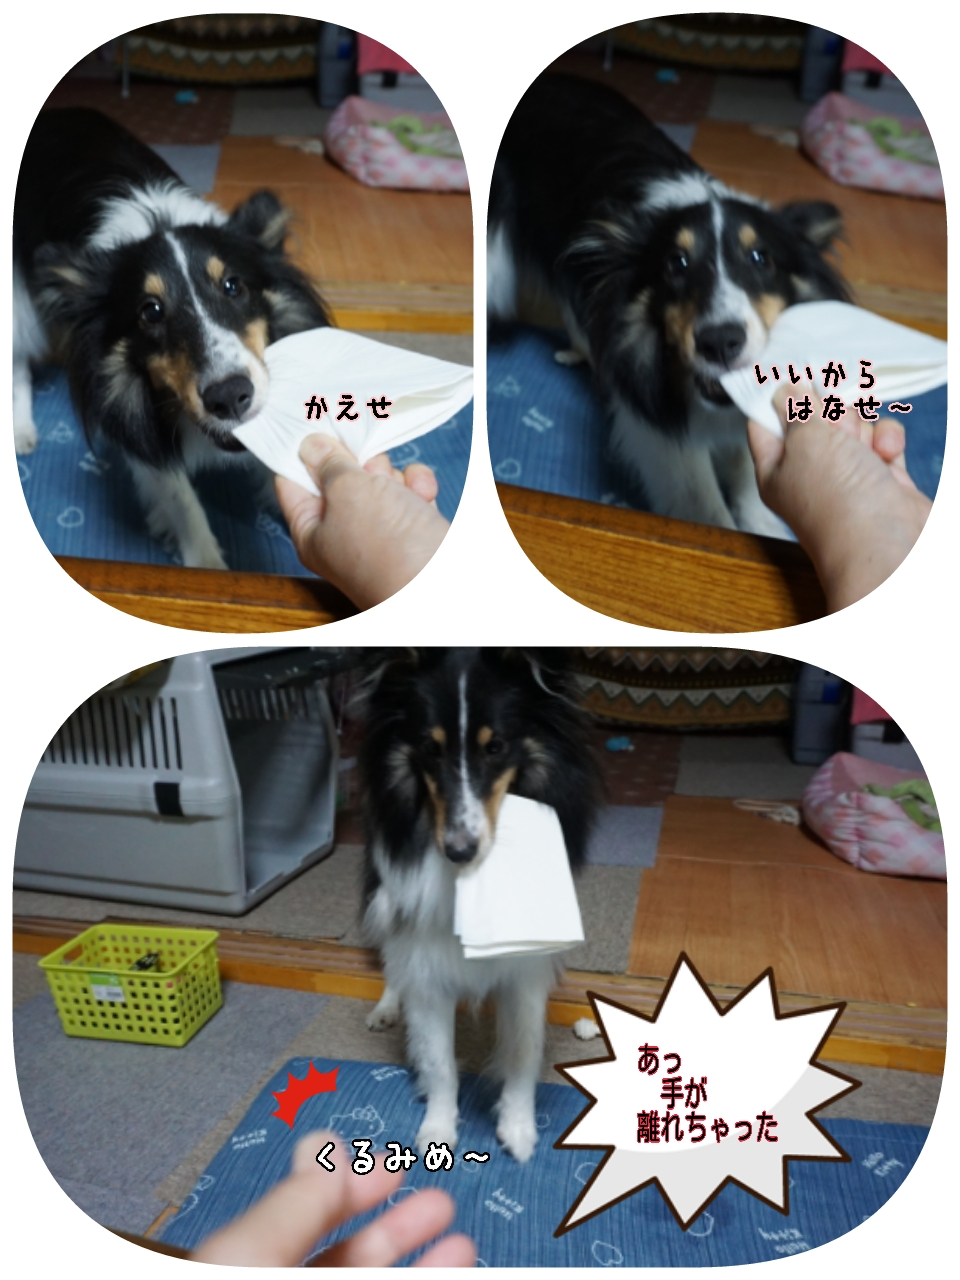 16-09-02-11-14-48-864_deco.jpg